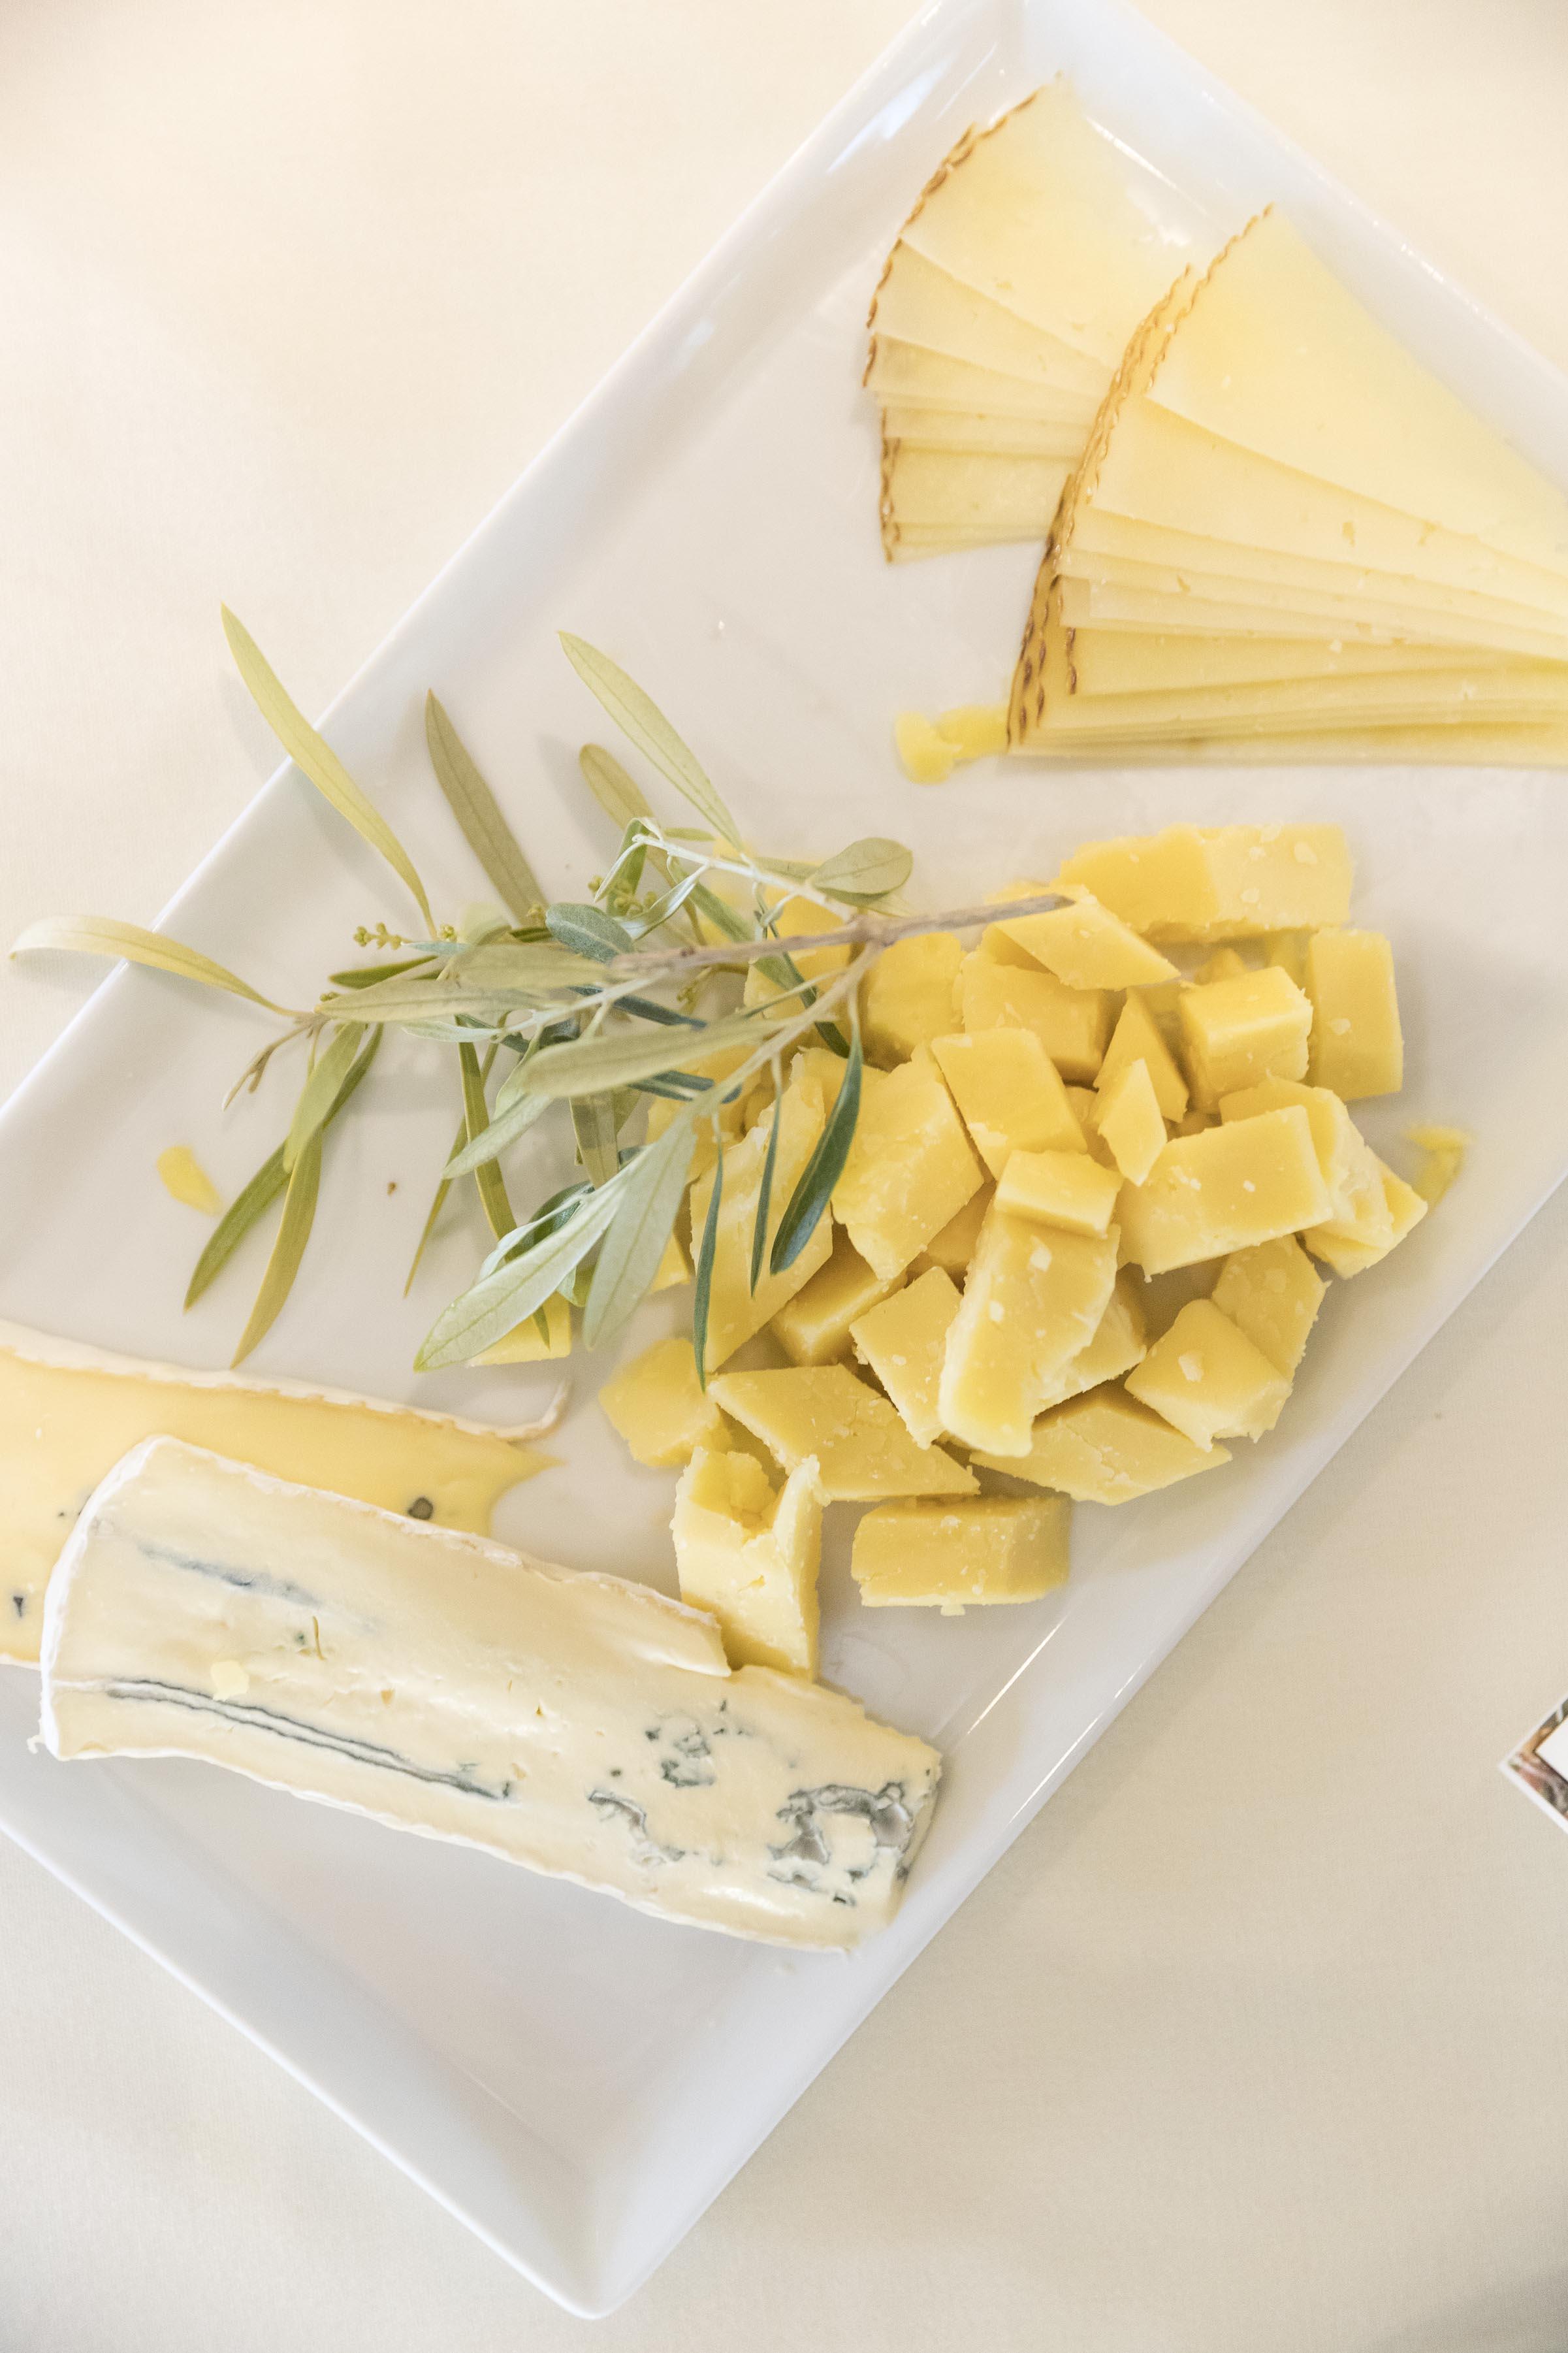 7143-ITAL FOODSGreatChefs-180421.jpg